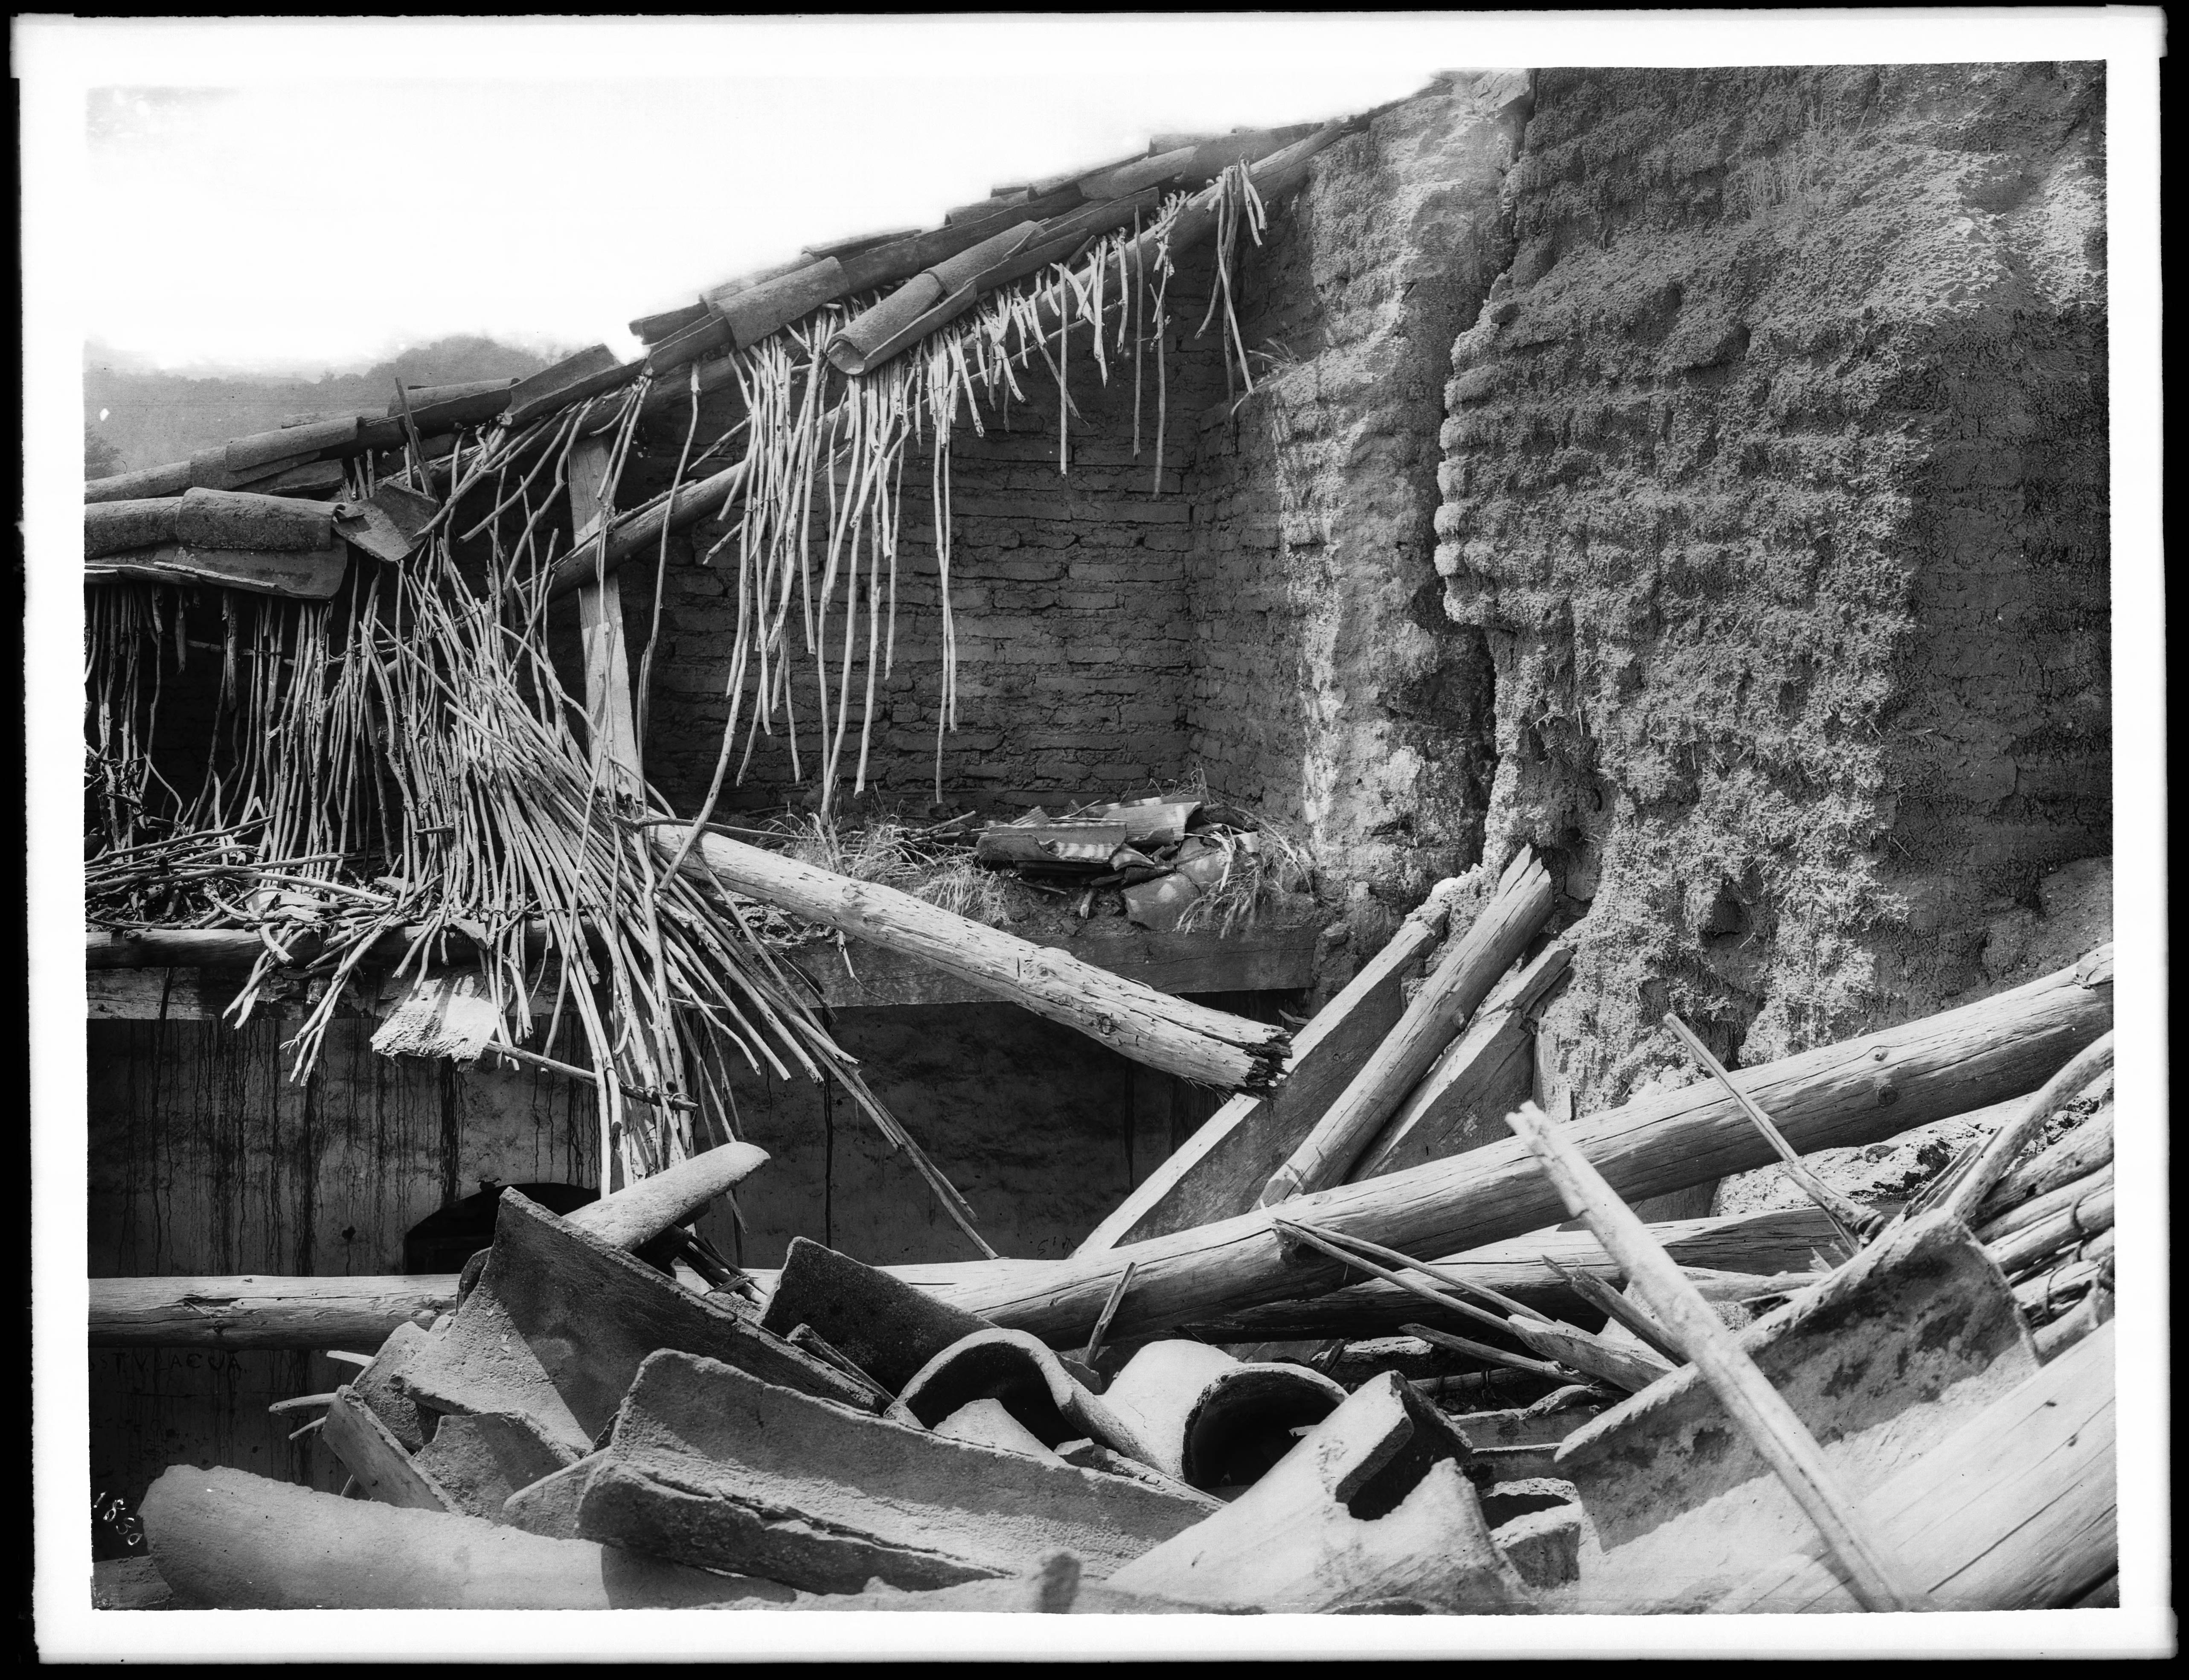 File Detail Of Tile Roof Laid On Tule Reeds At Mission San